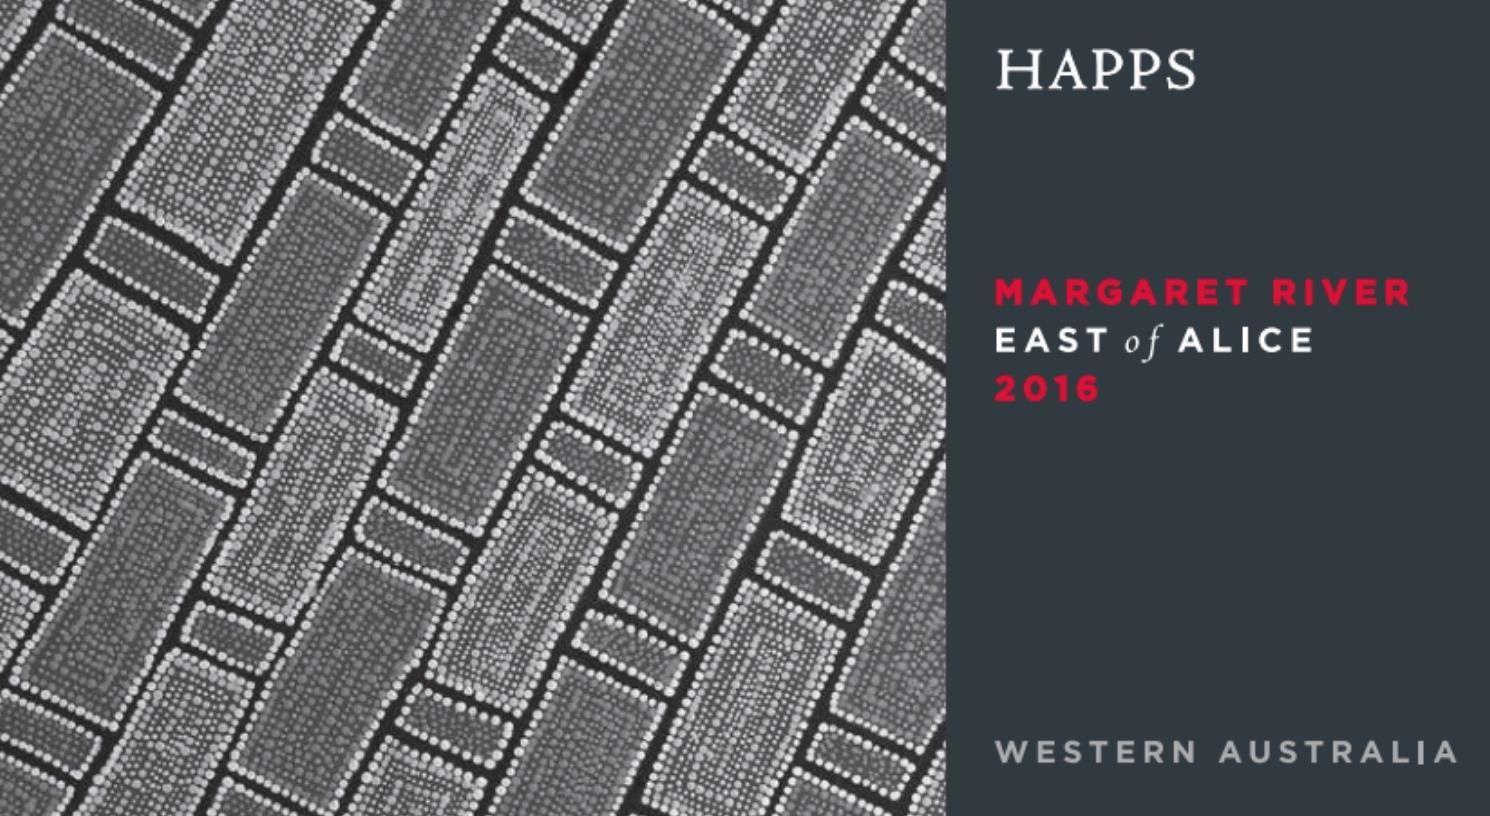 Happs East of Alice 2016